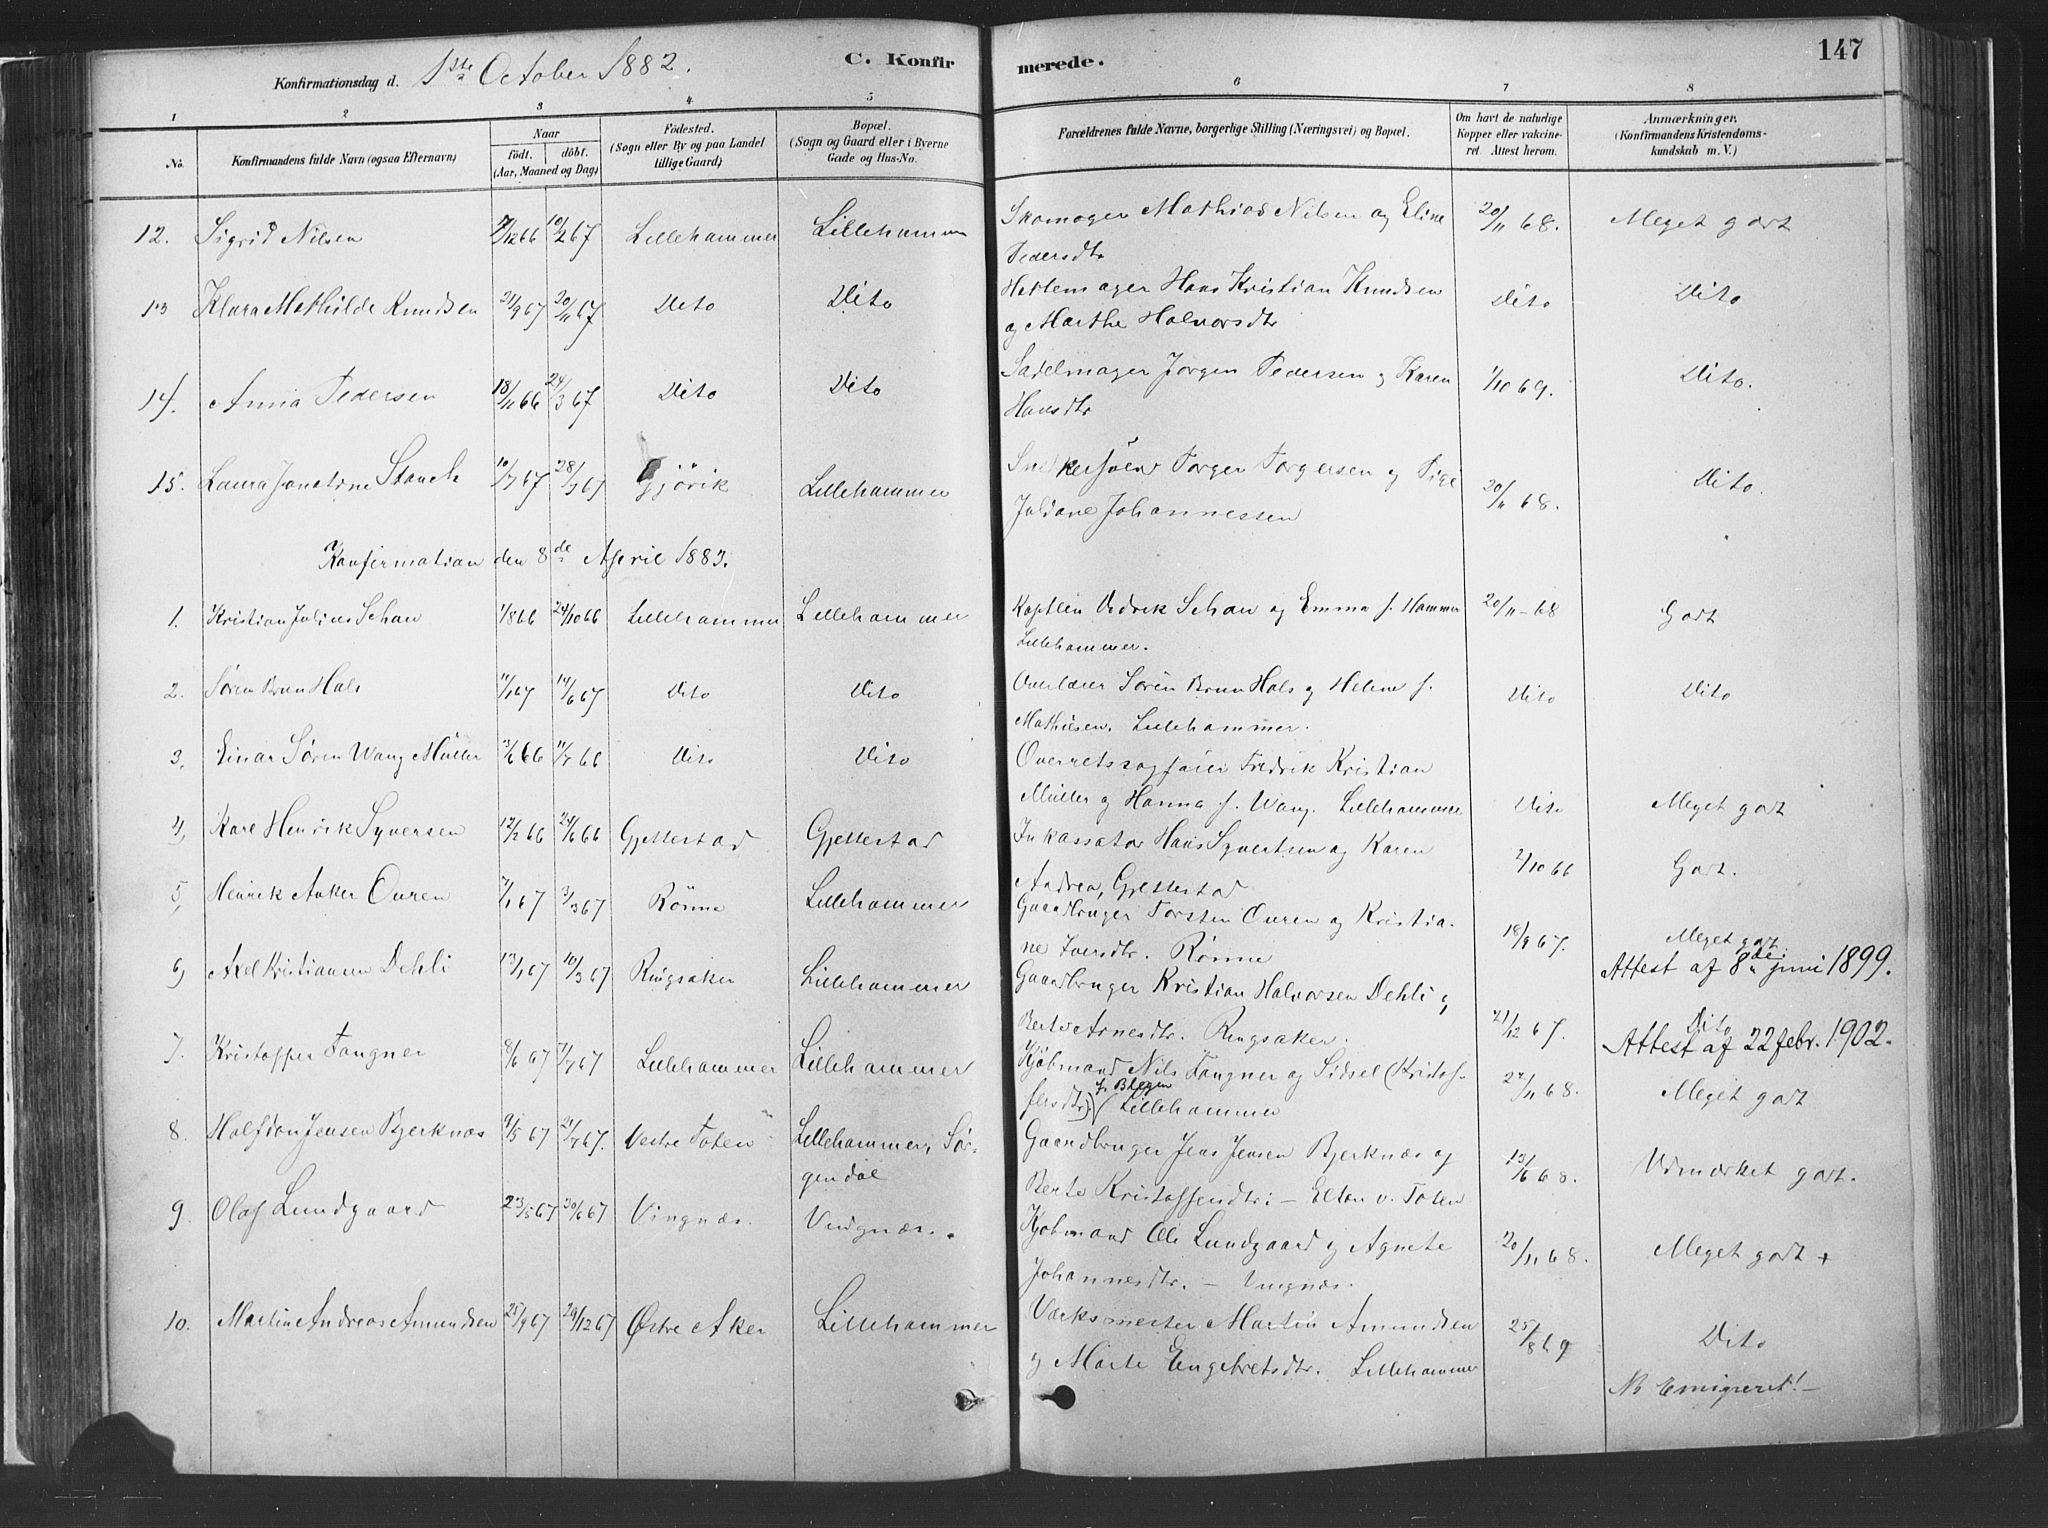 SAH, Fåberg prestekontor, Ministerialbok nr. 10, 1879-1900, s. 147